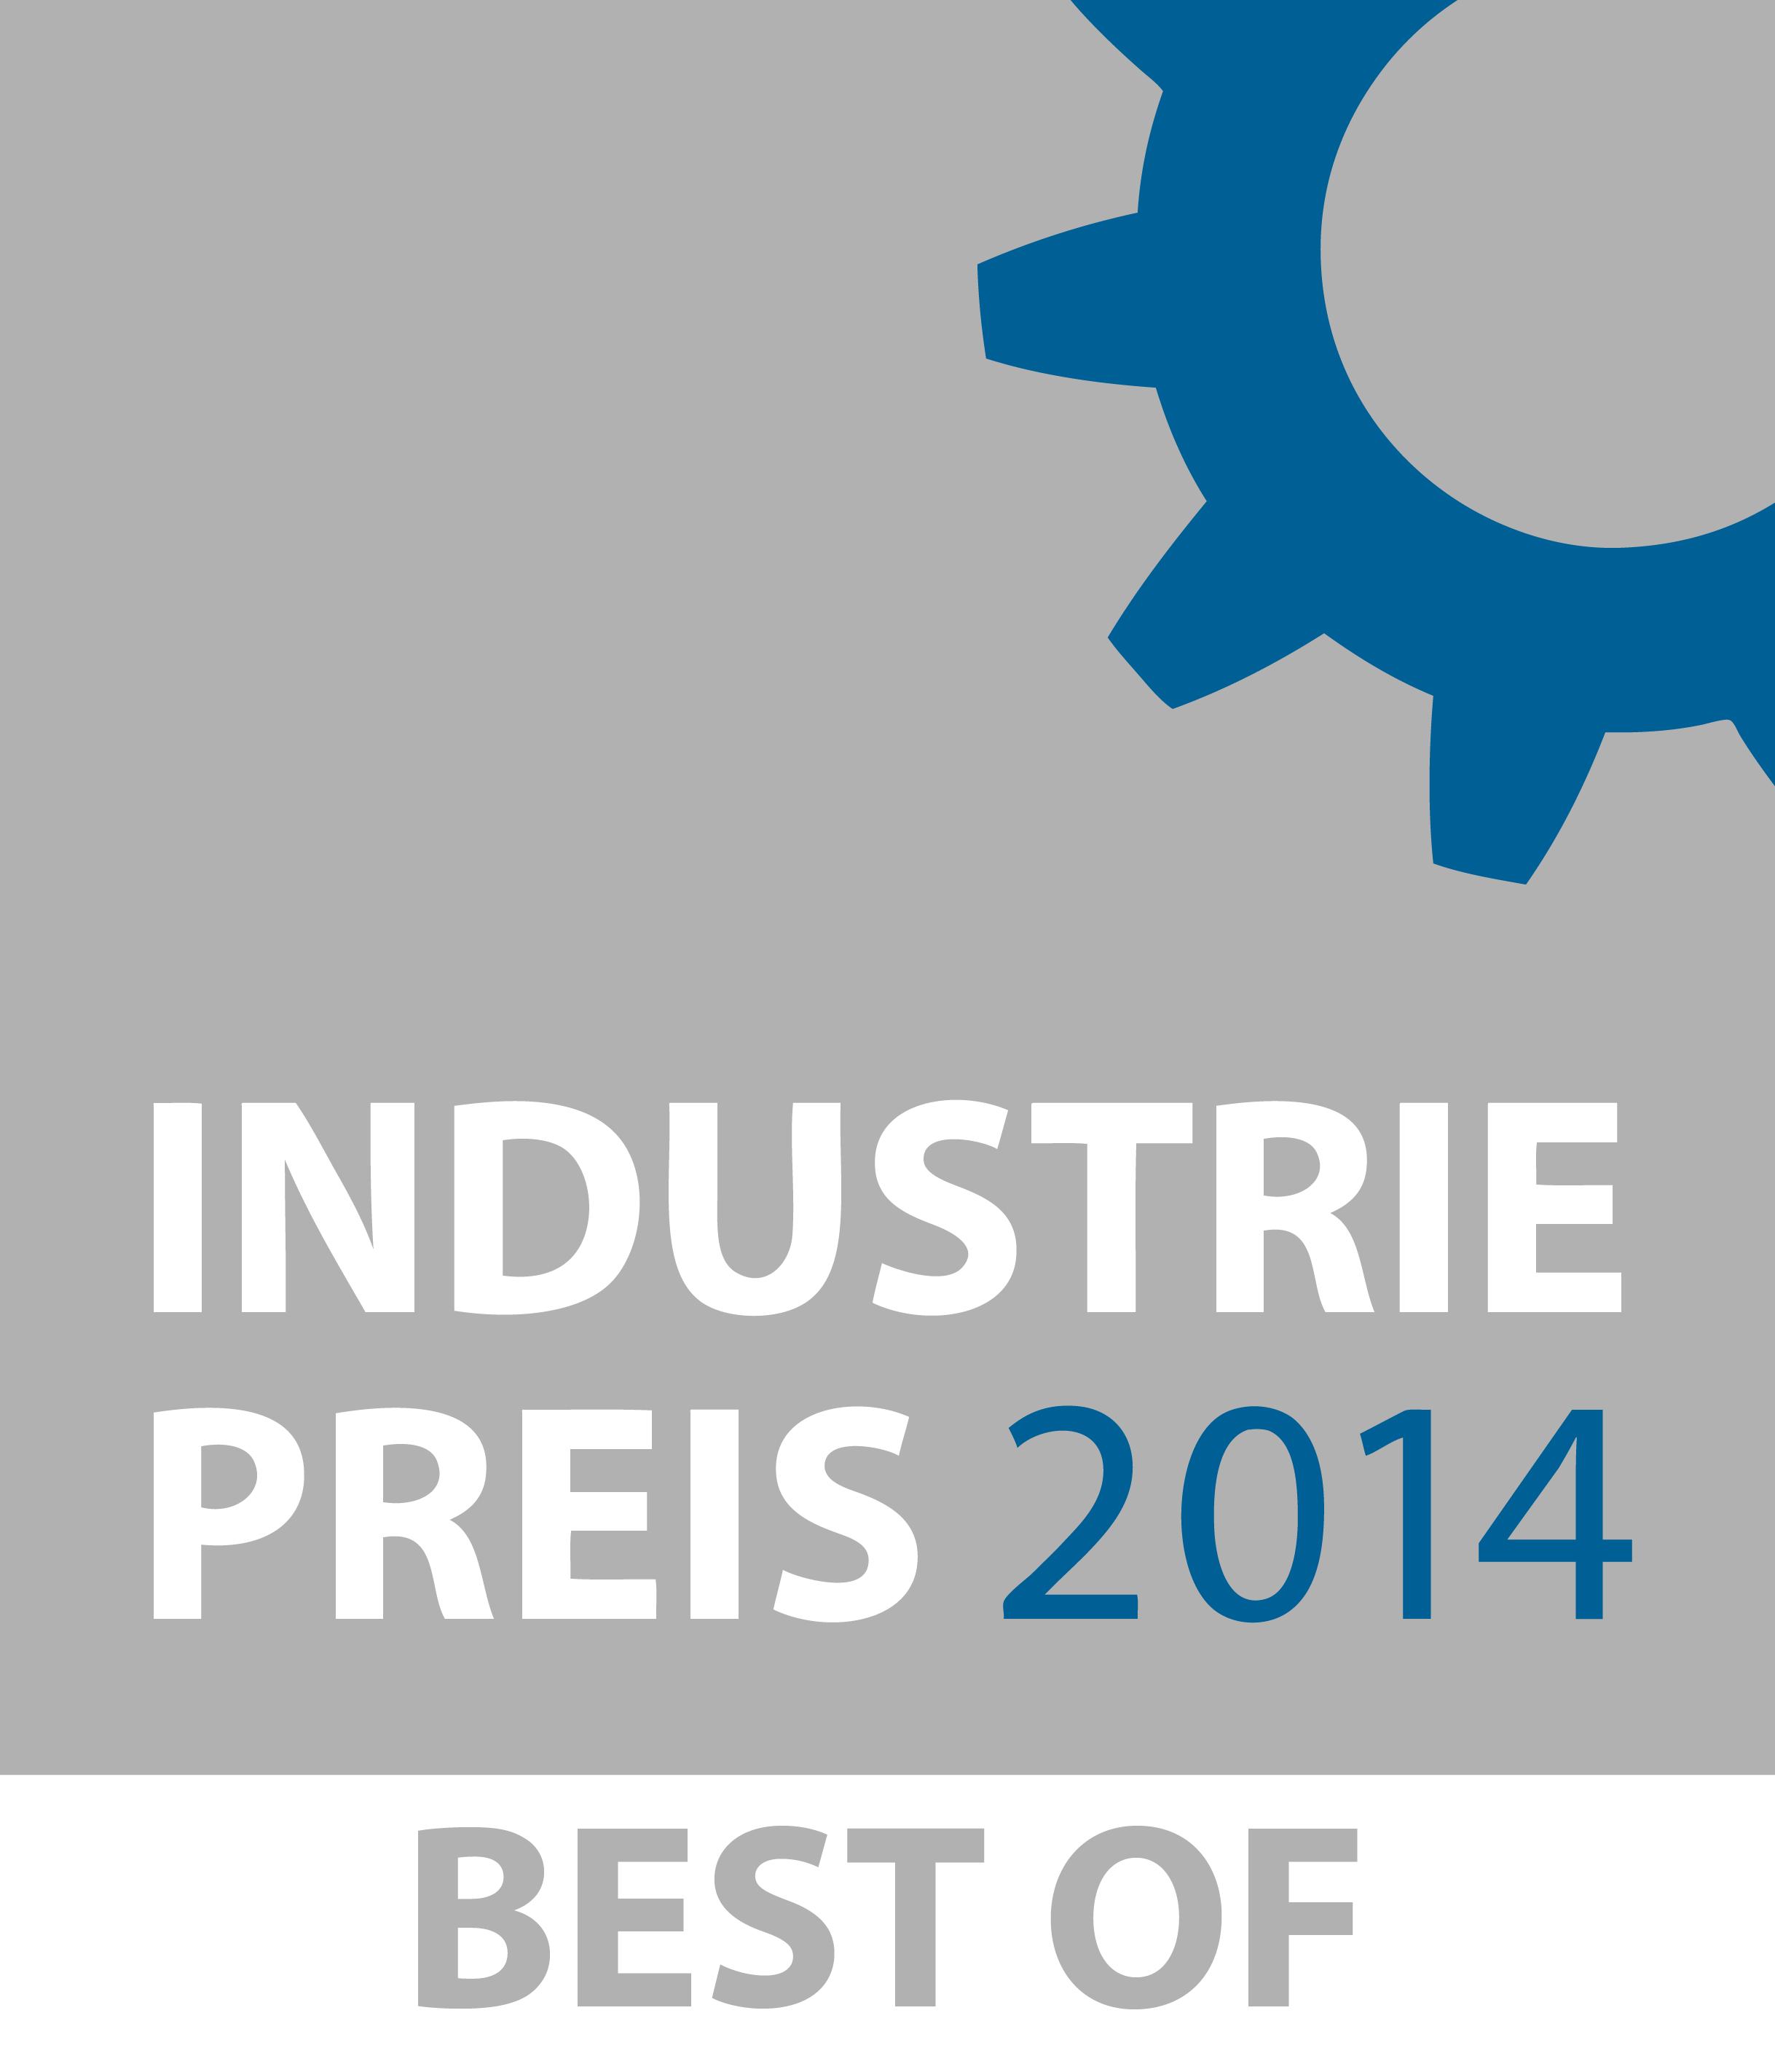 industriepreis 2014 q learning